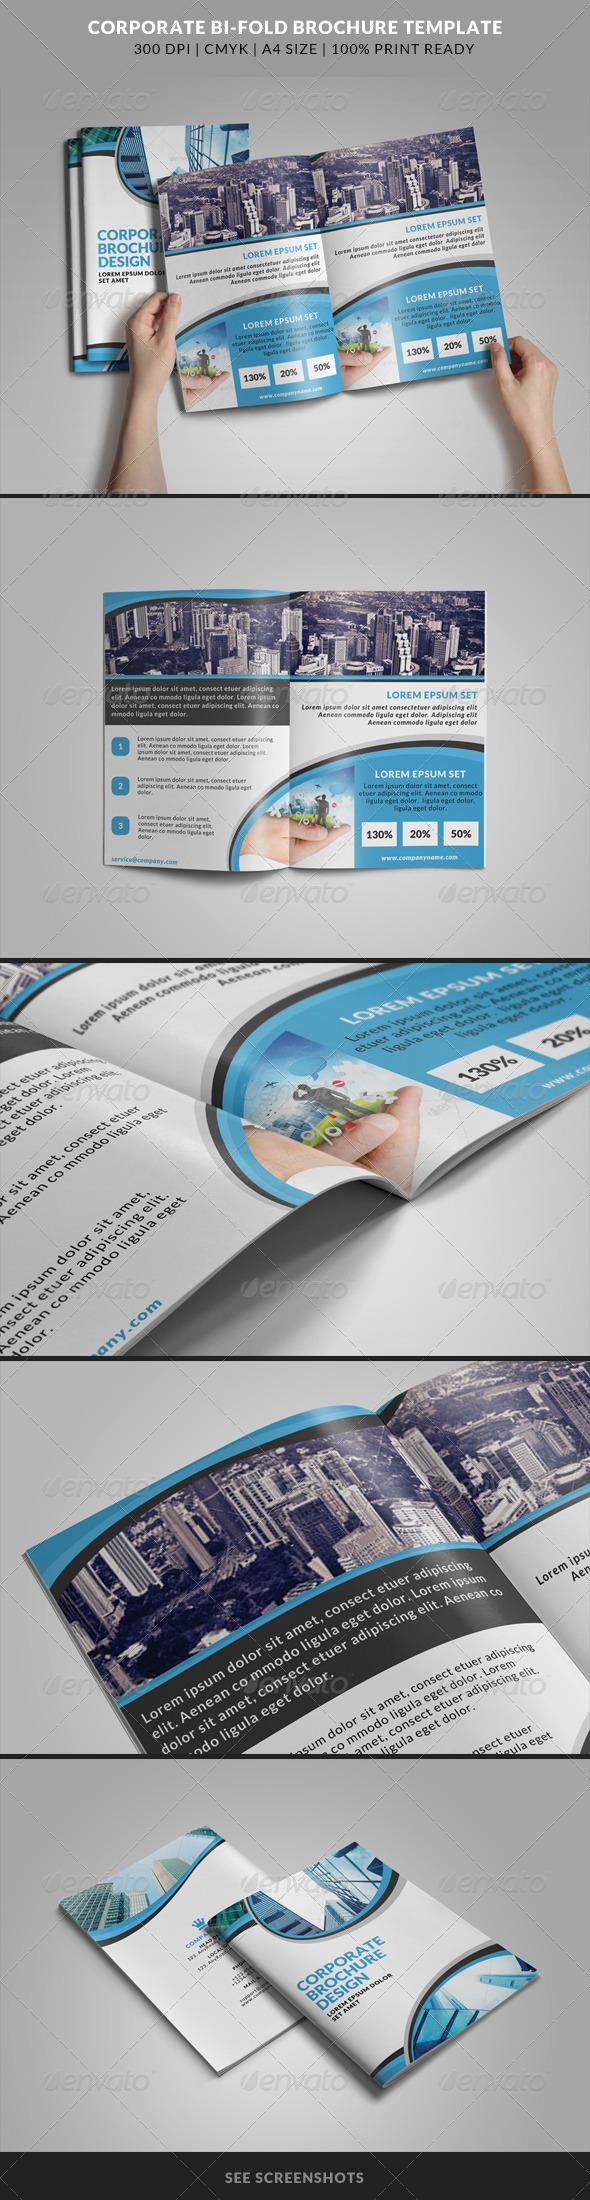 GraphicRiver Corporate Bi-Fold Brochures Template 5 8228757